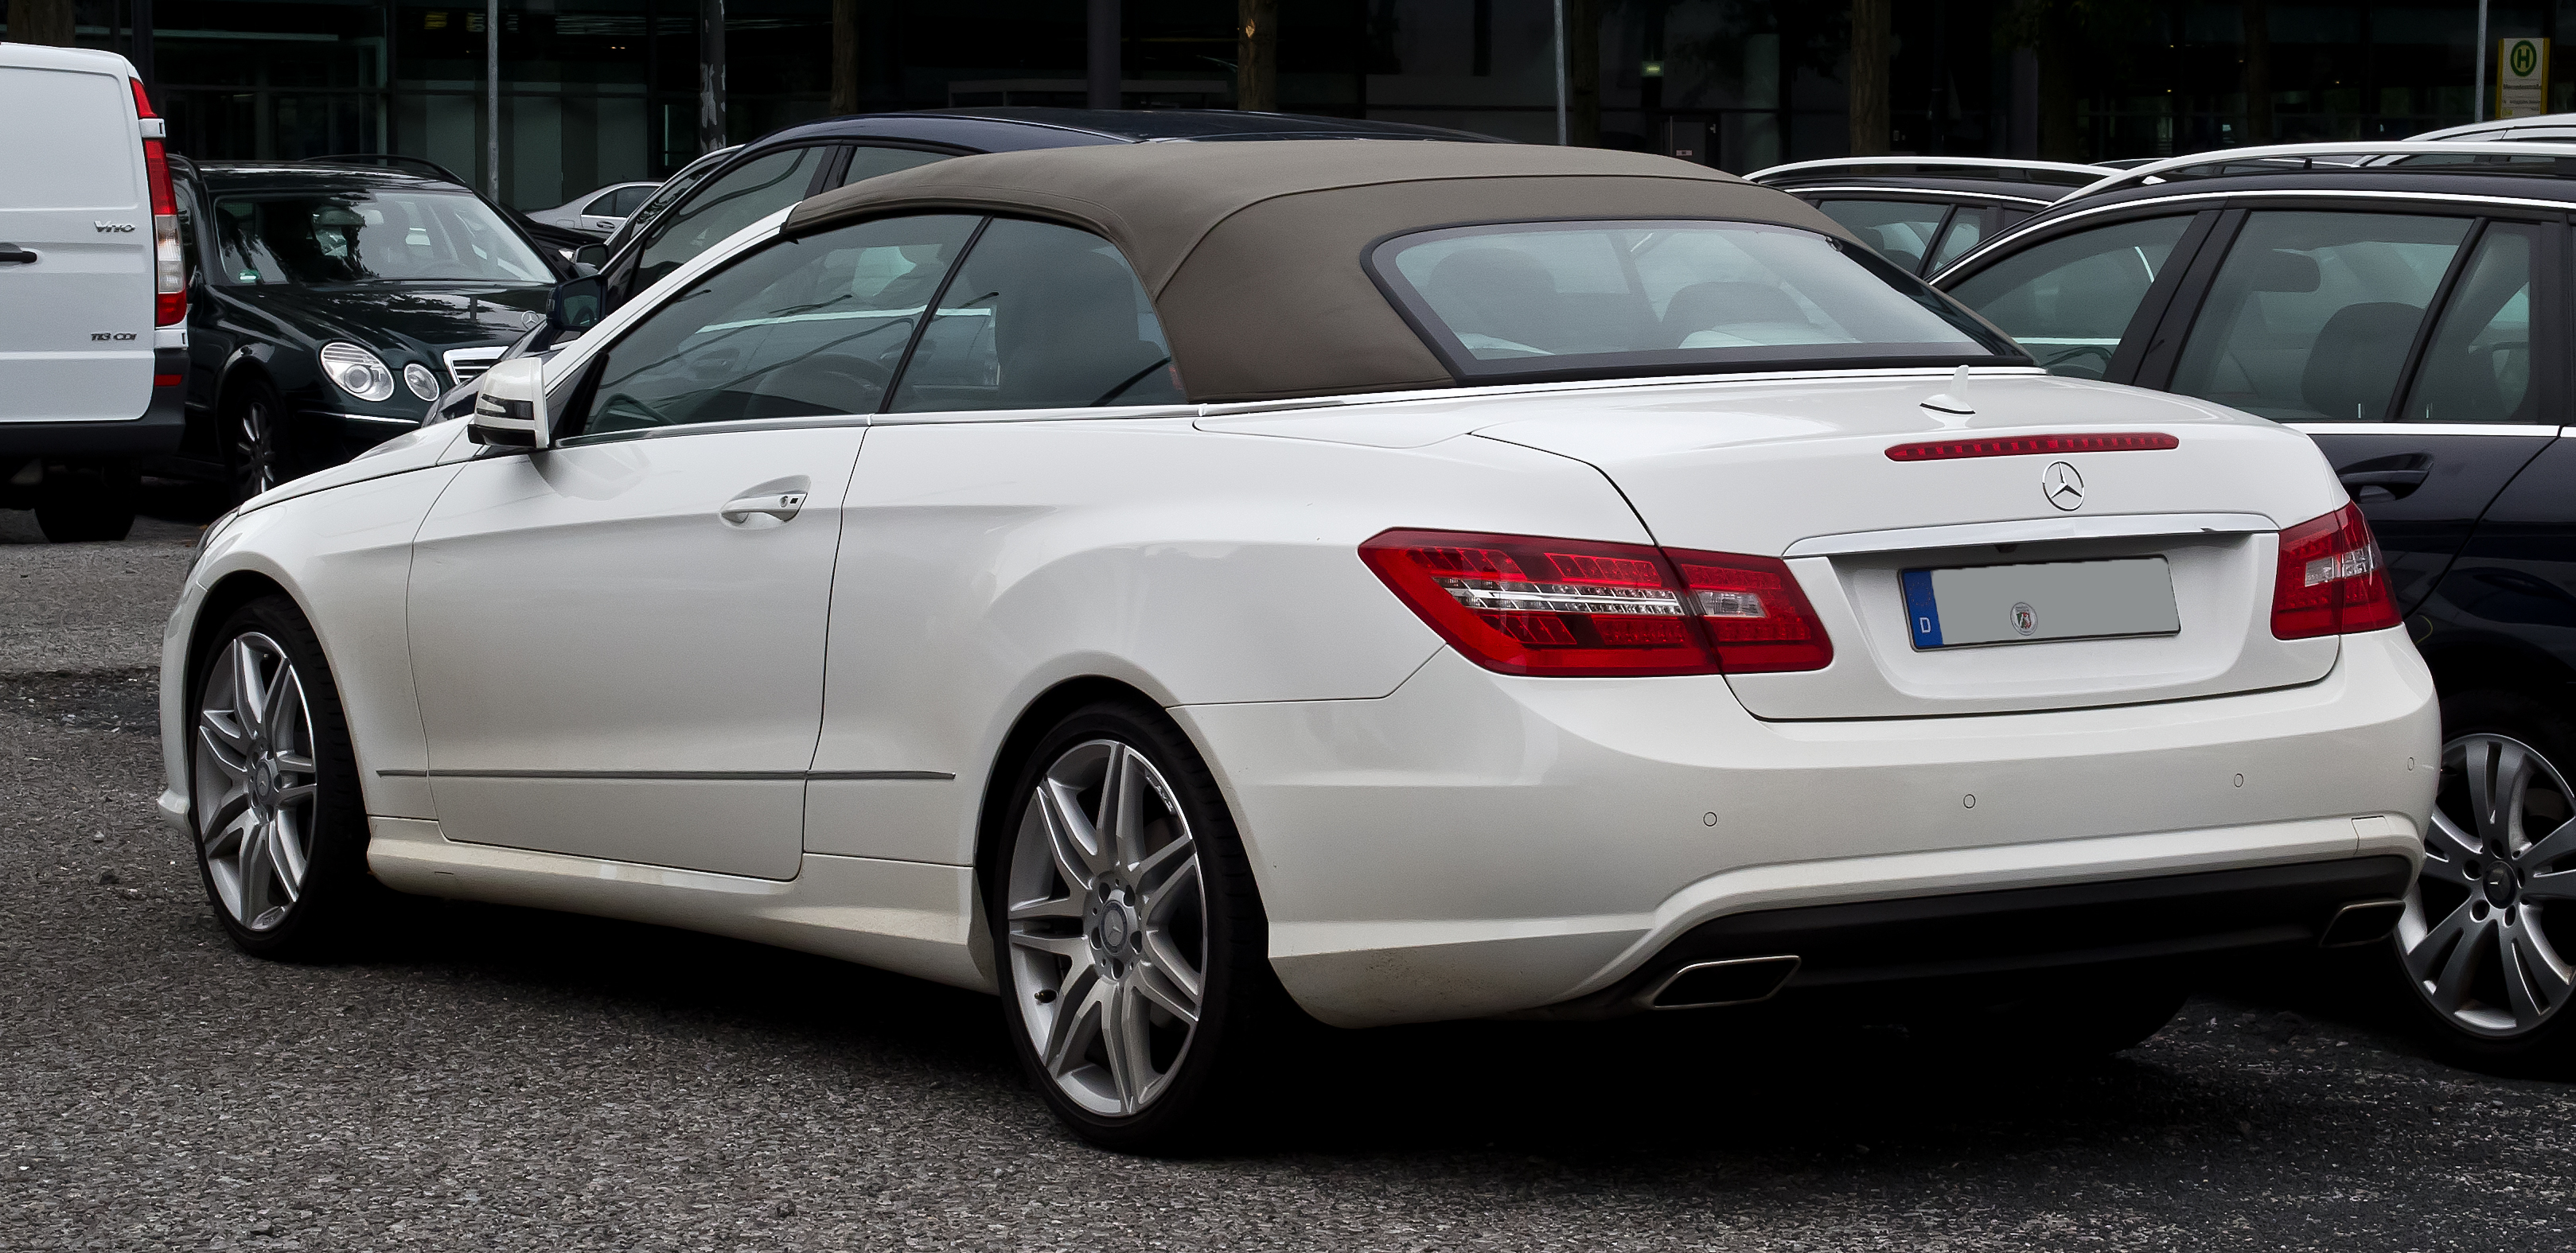 Gle Mercedes Wiki